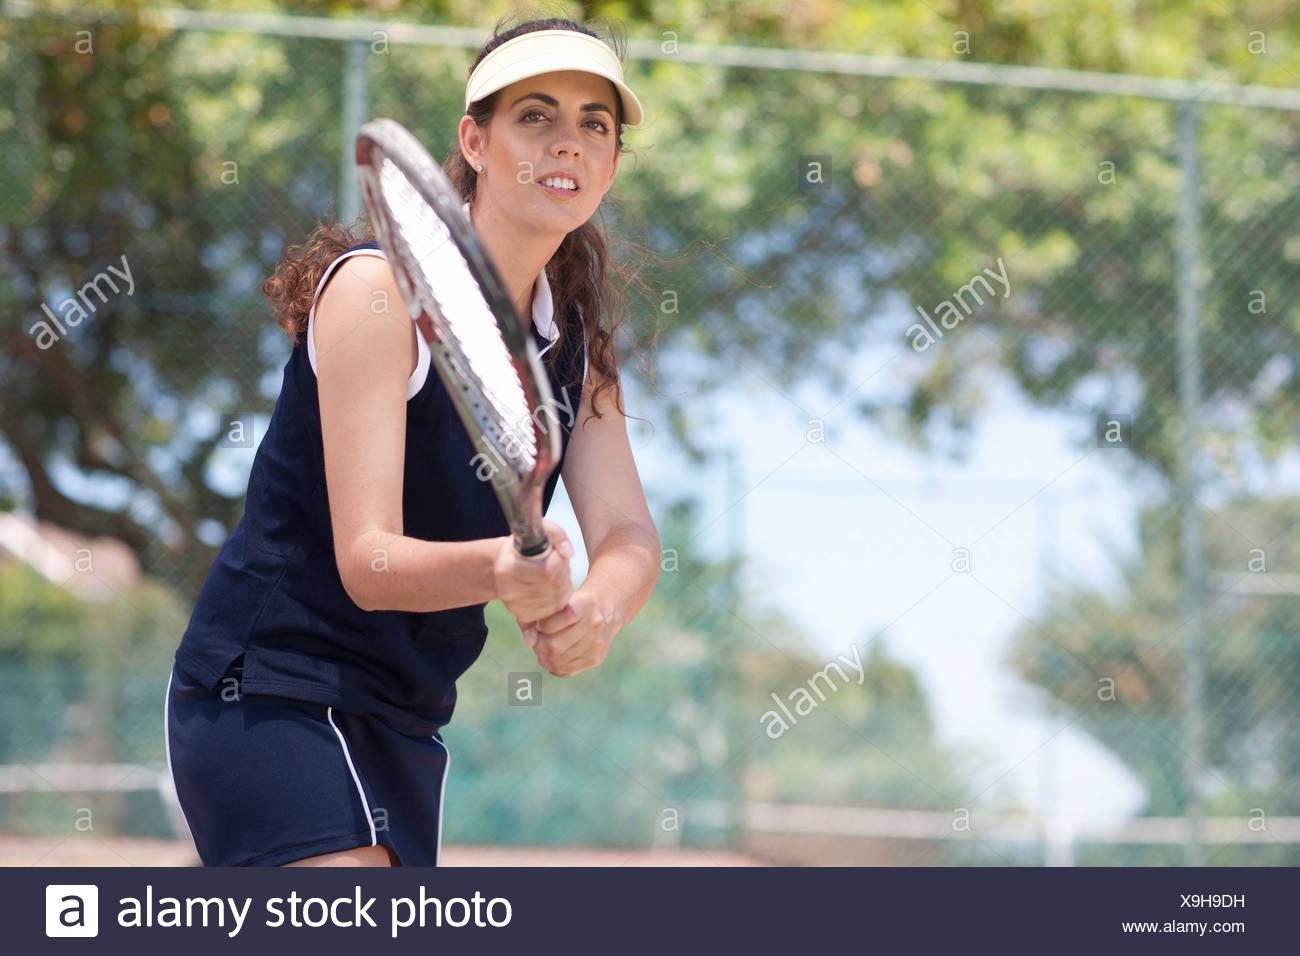 Tennis players returning ball - Stock Image